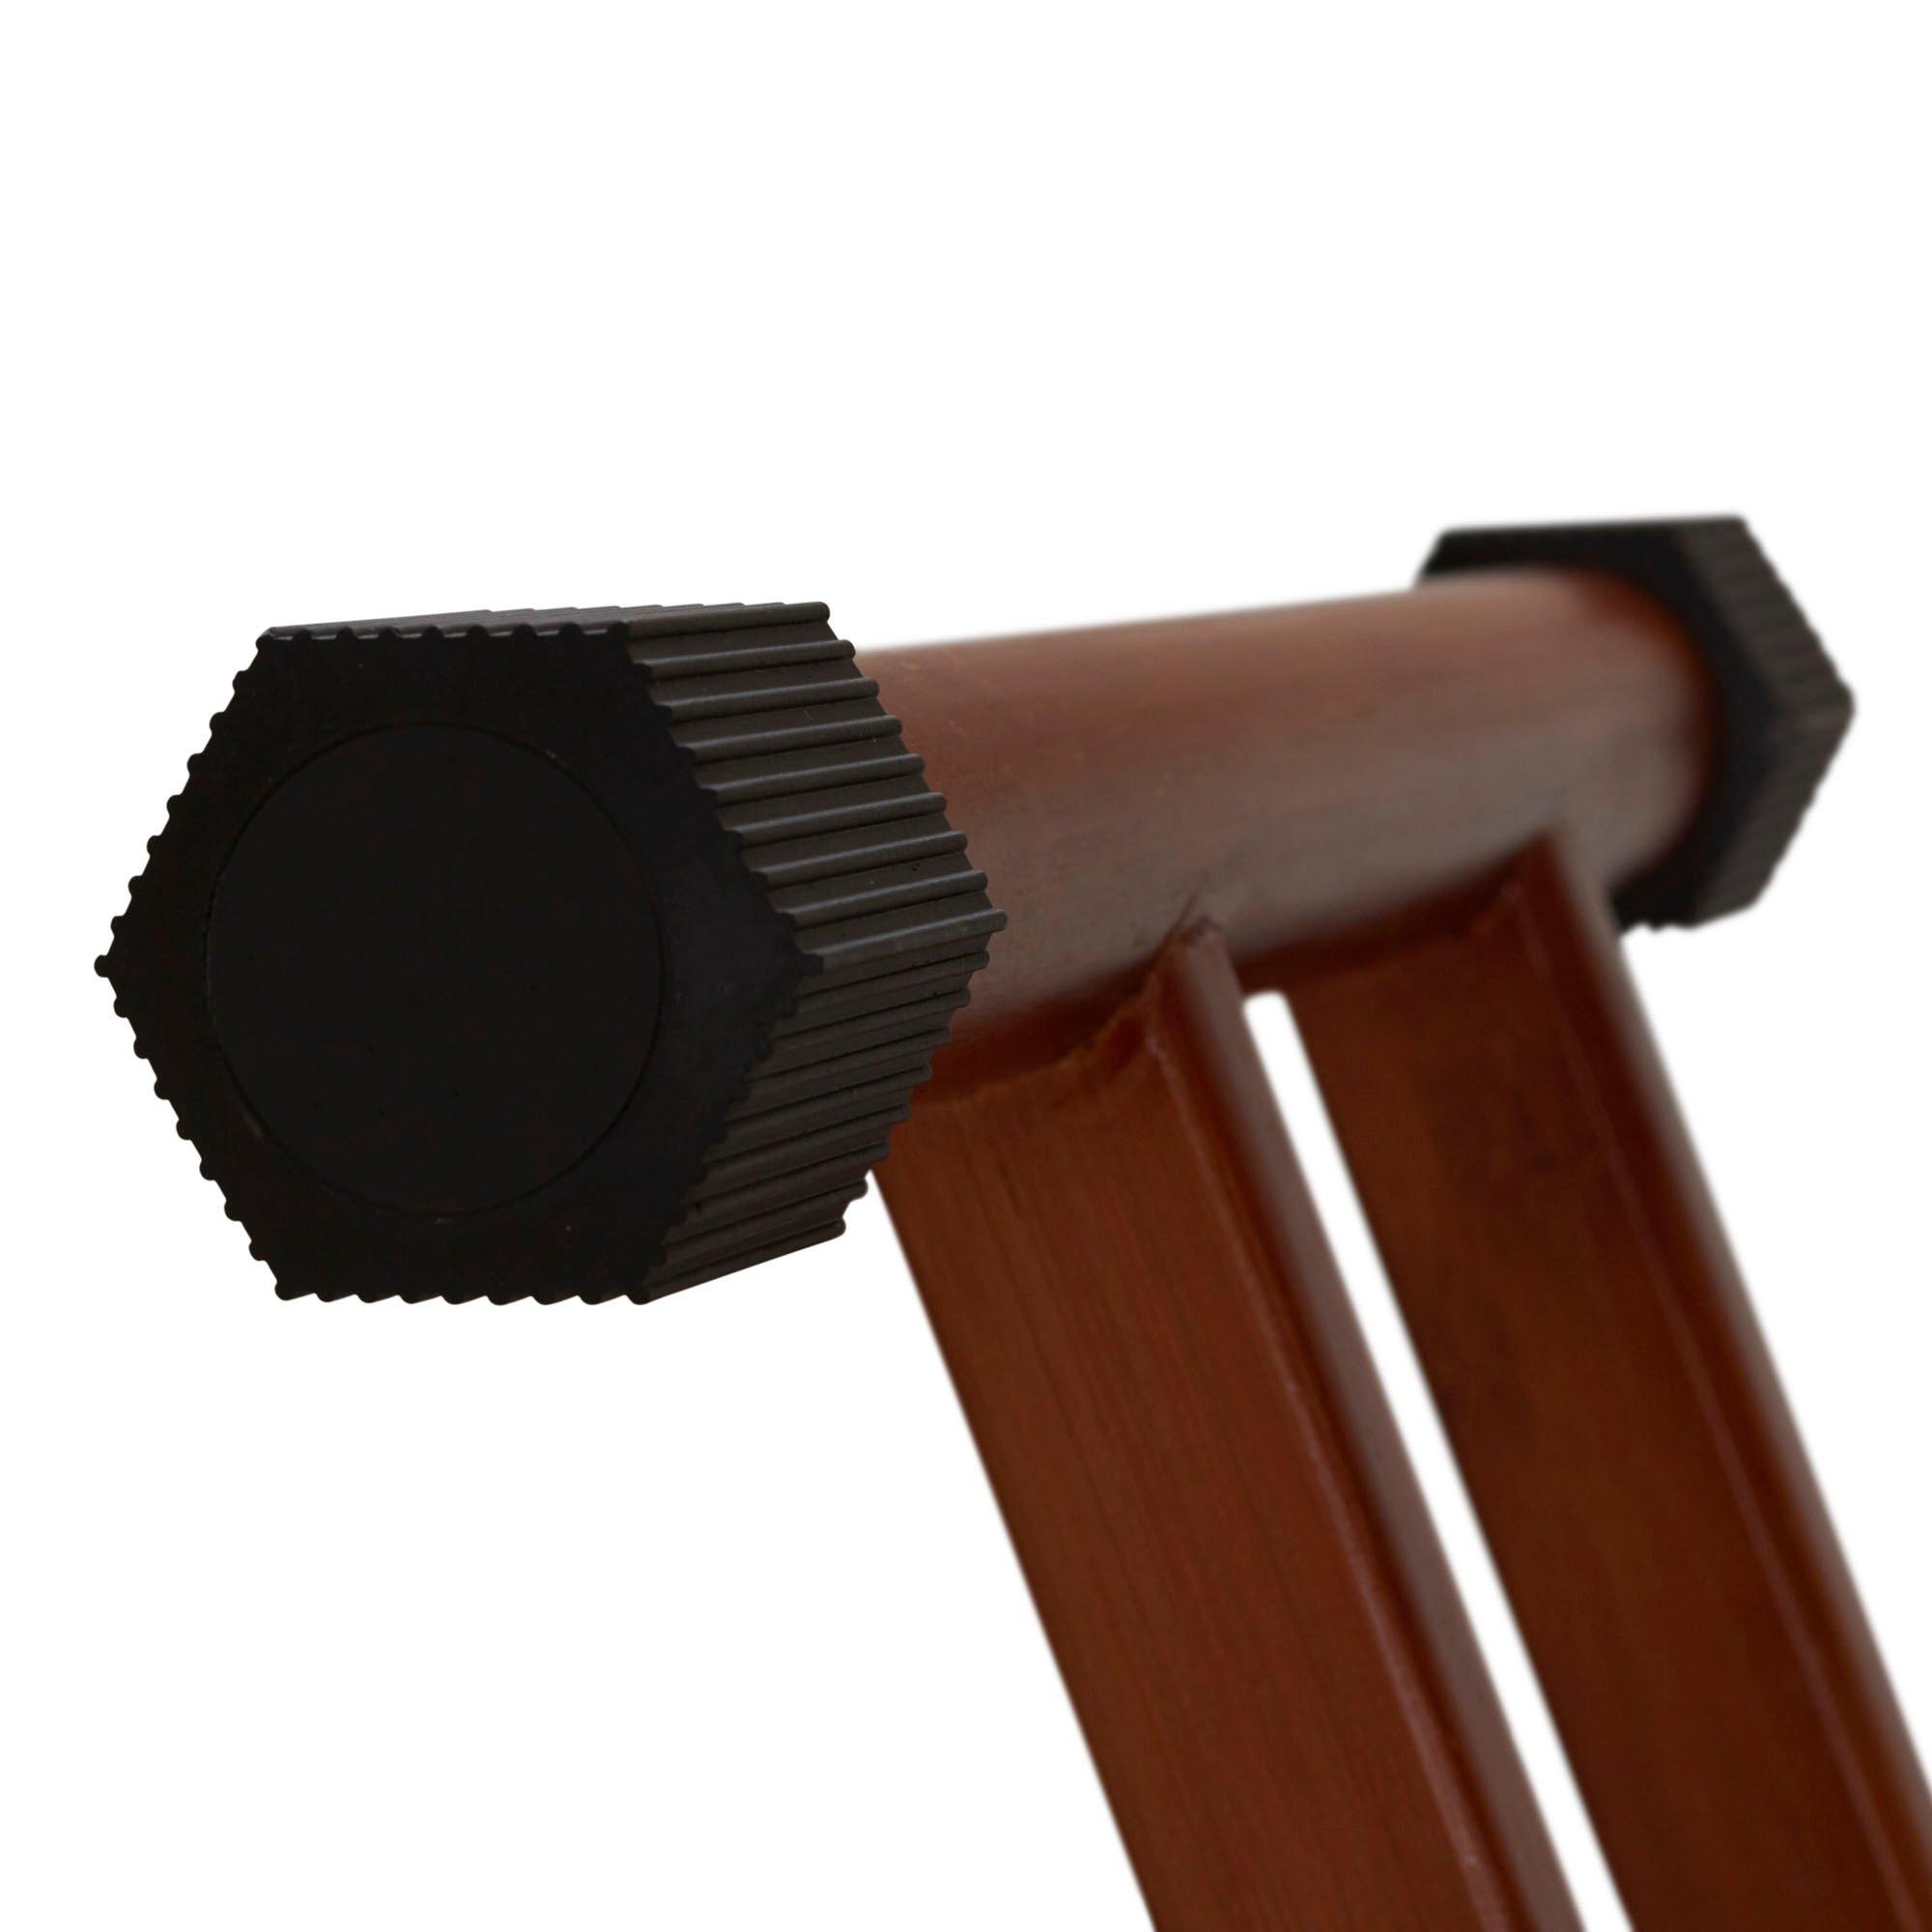 MattsGlobal Bamboo Leg Ironing Board with Iron Rest Cotton Wood Free Standing Iron Holder Dark Frame by MattsGlobal (Image #3)